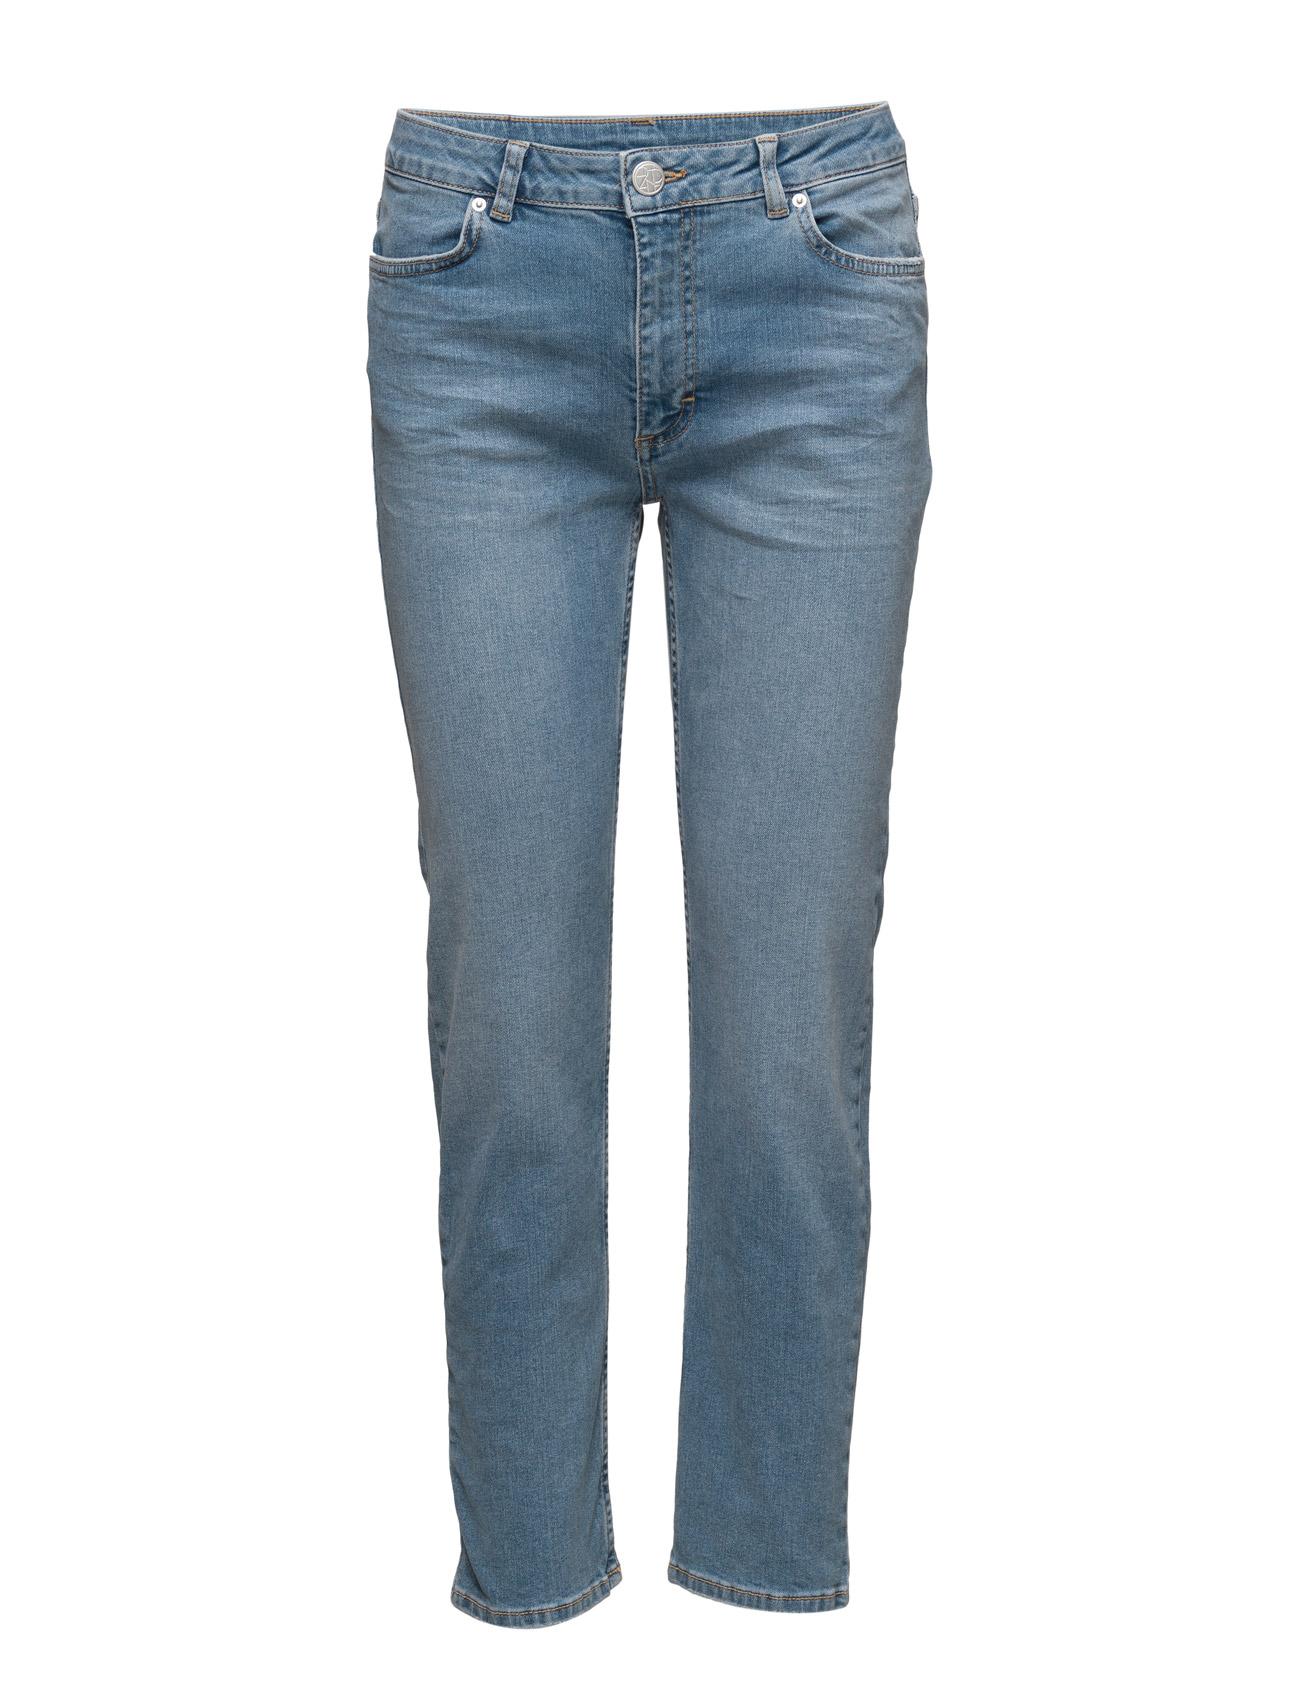 2nd one Malou 084 crop, blue worth, jeans på boozt.com dk